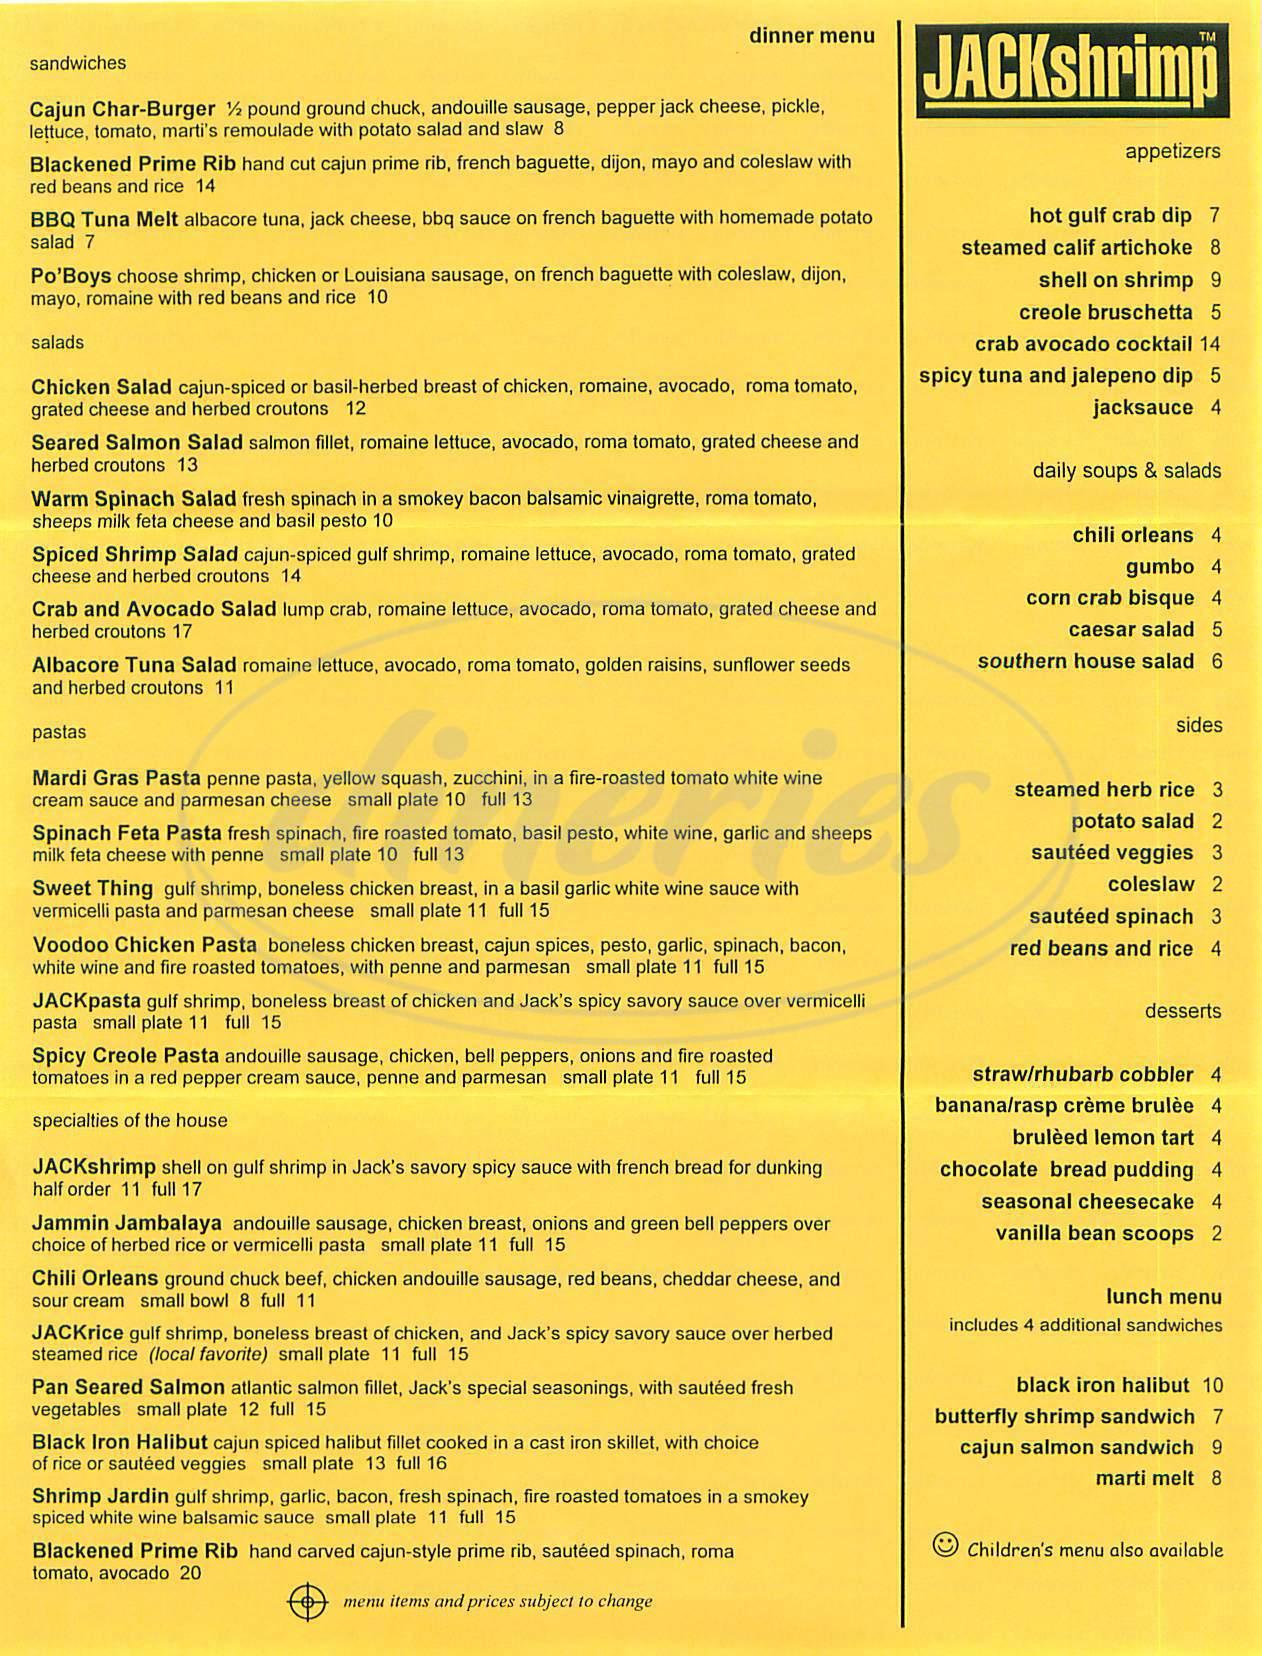 menu for Jack Shrimp Restaurant